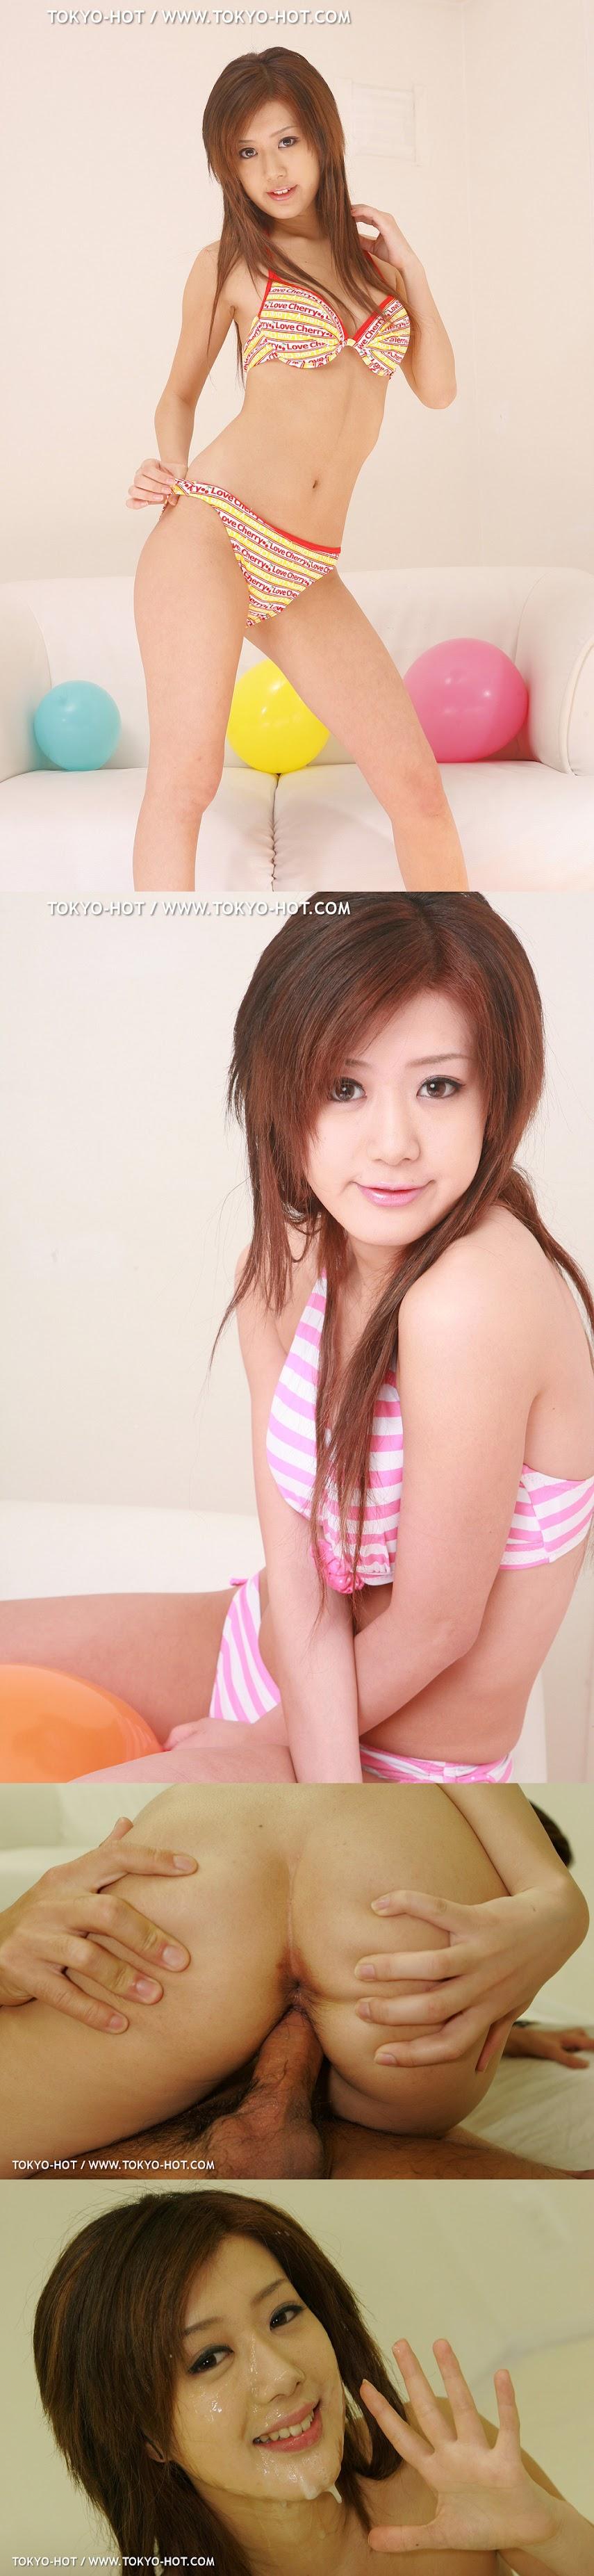 e214megumi_ishikawa_001.zip-jk- Tokyo-Hot e215risako mamiya 002 tokyo-hot 09160